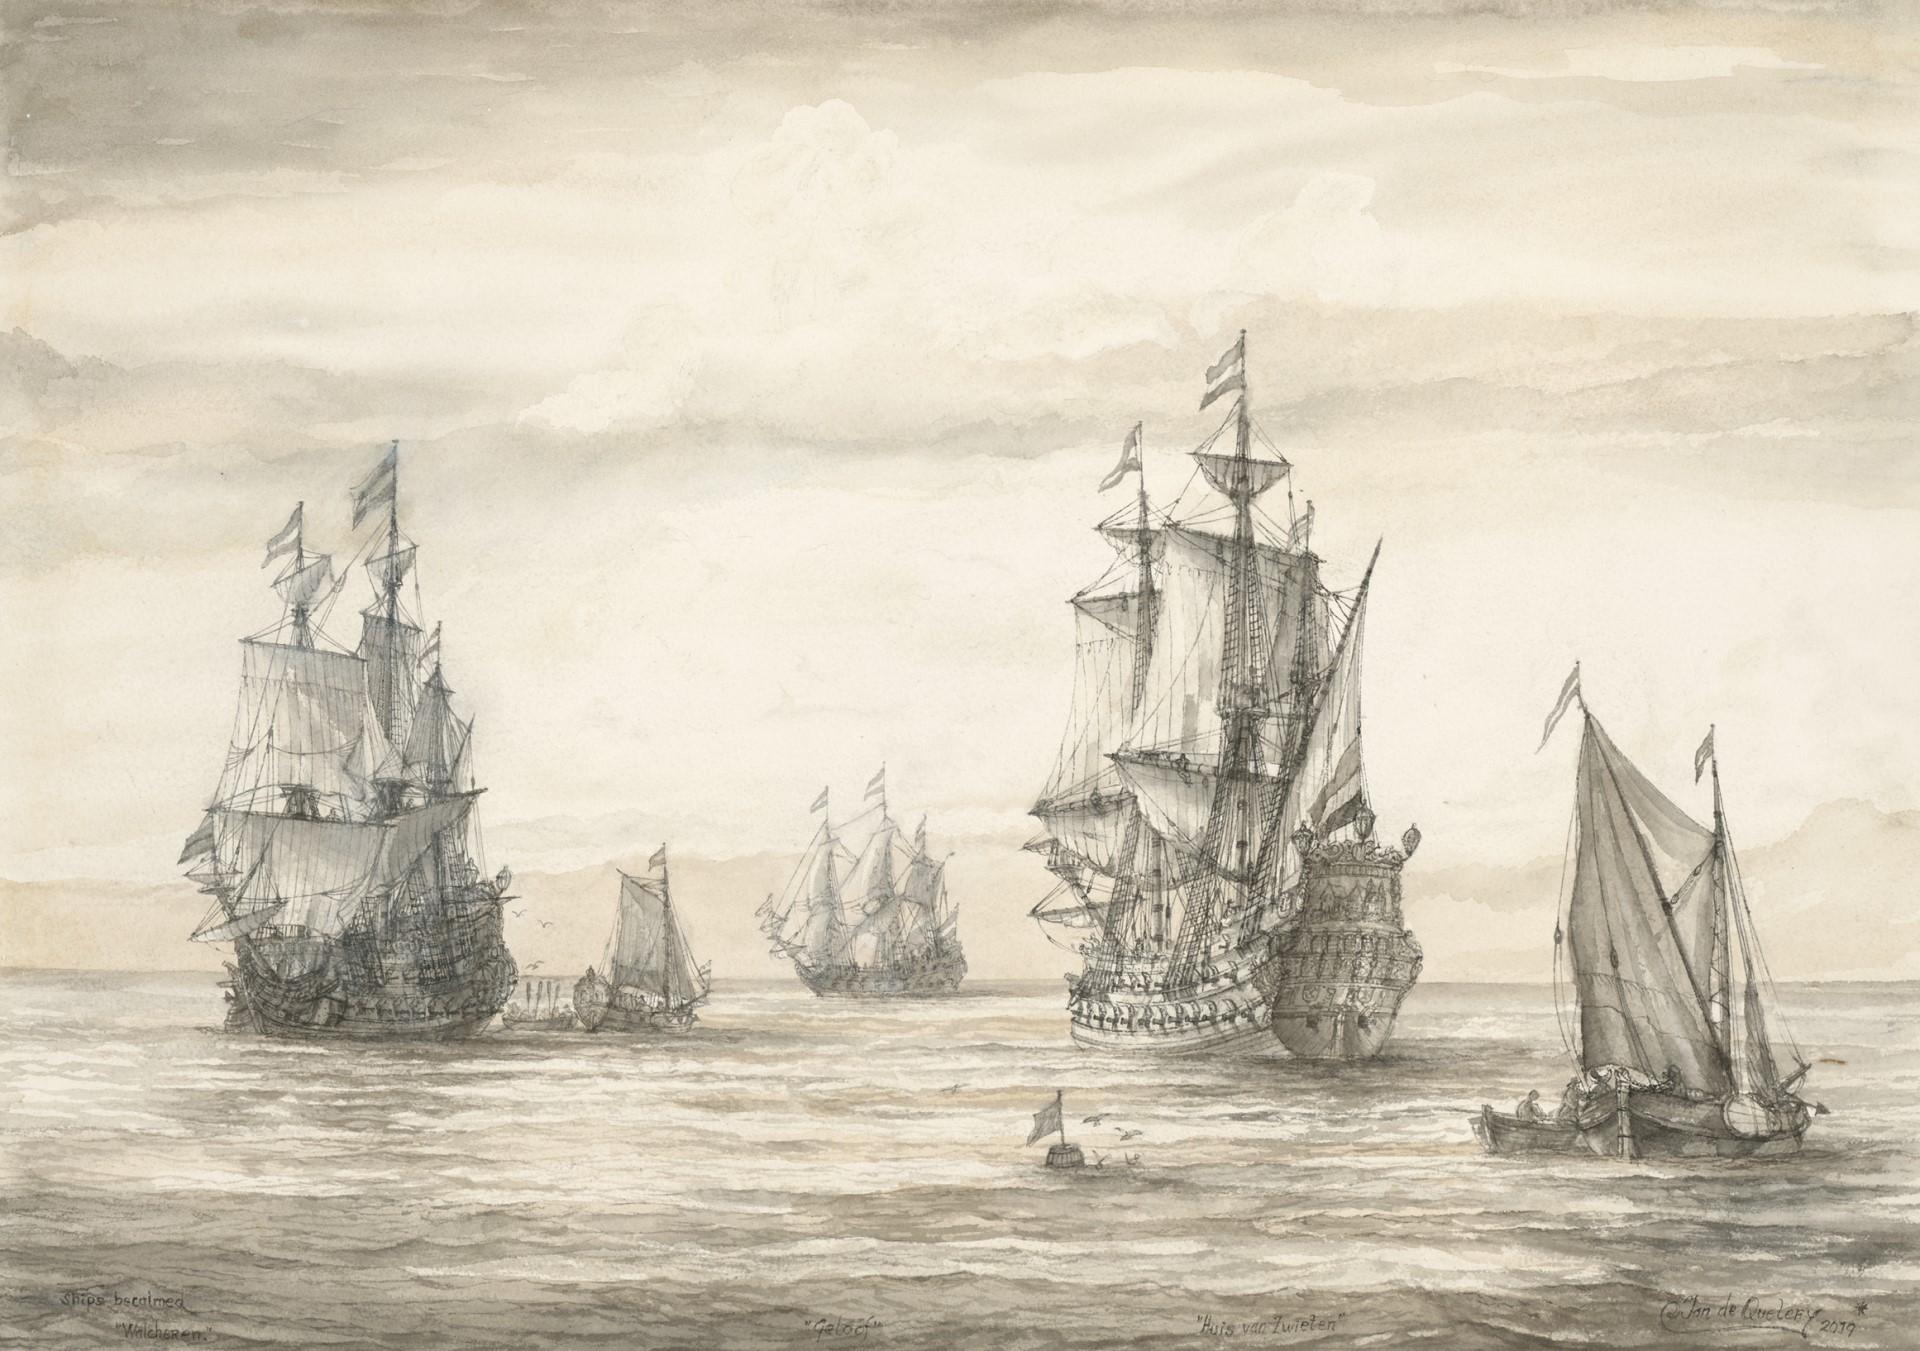 Ship be calmed and Walcheren